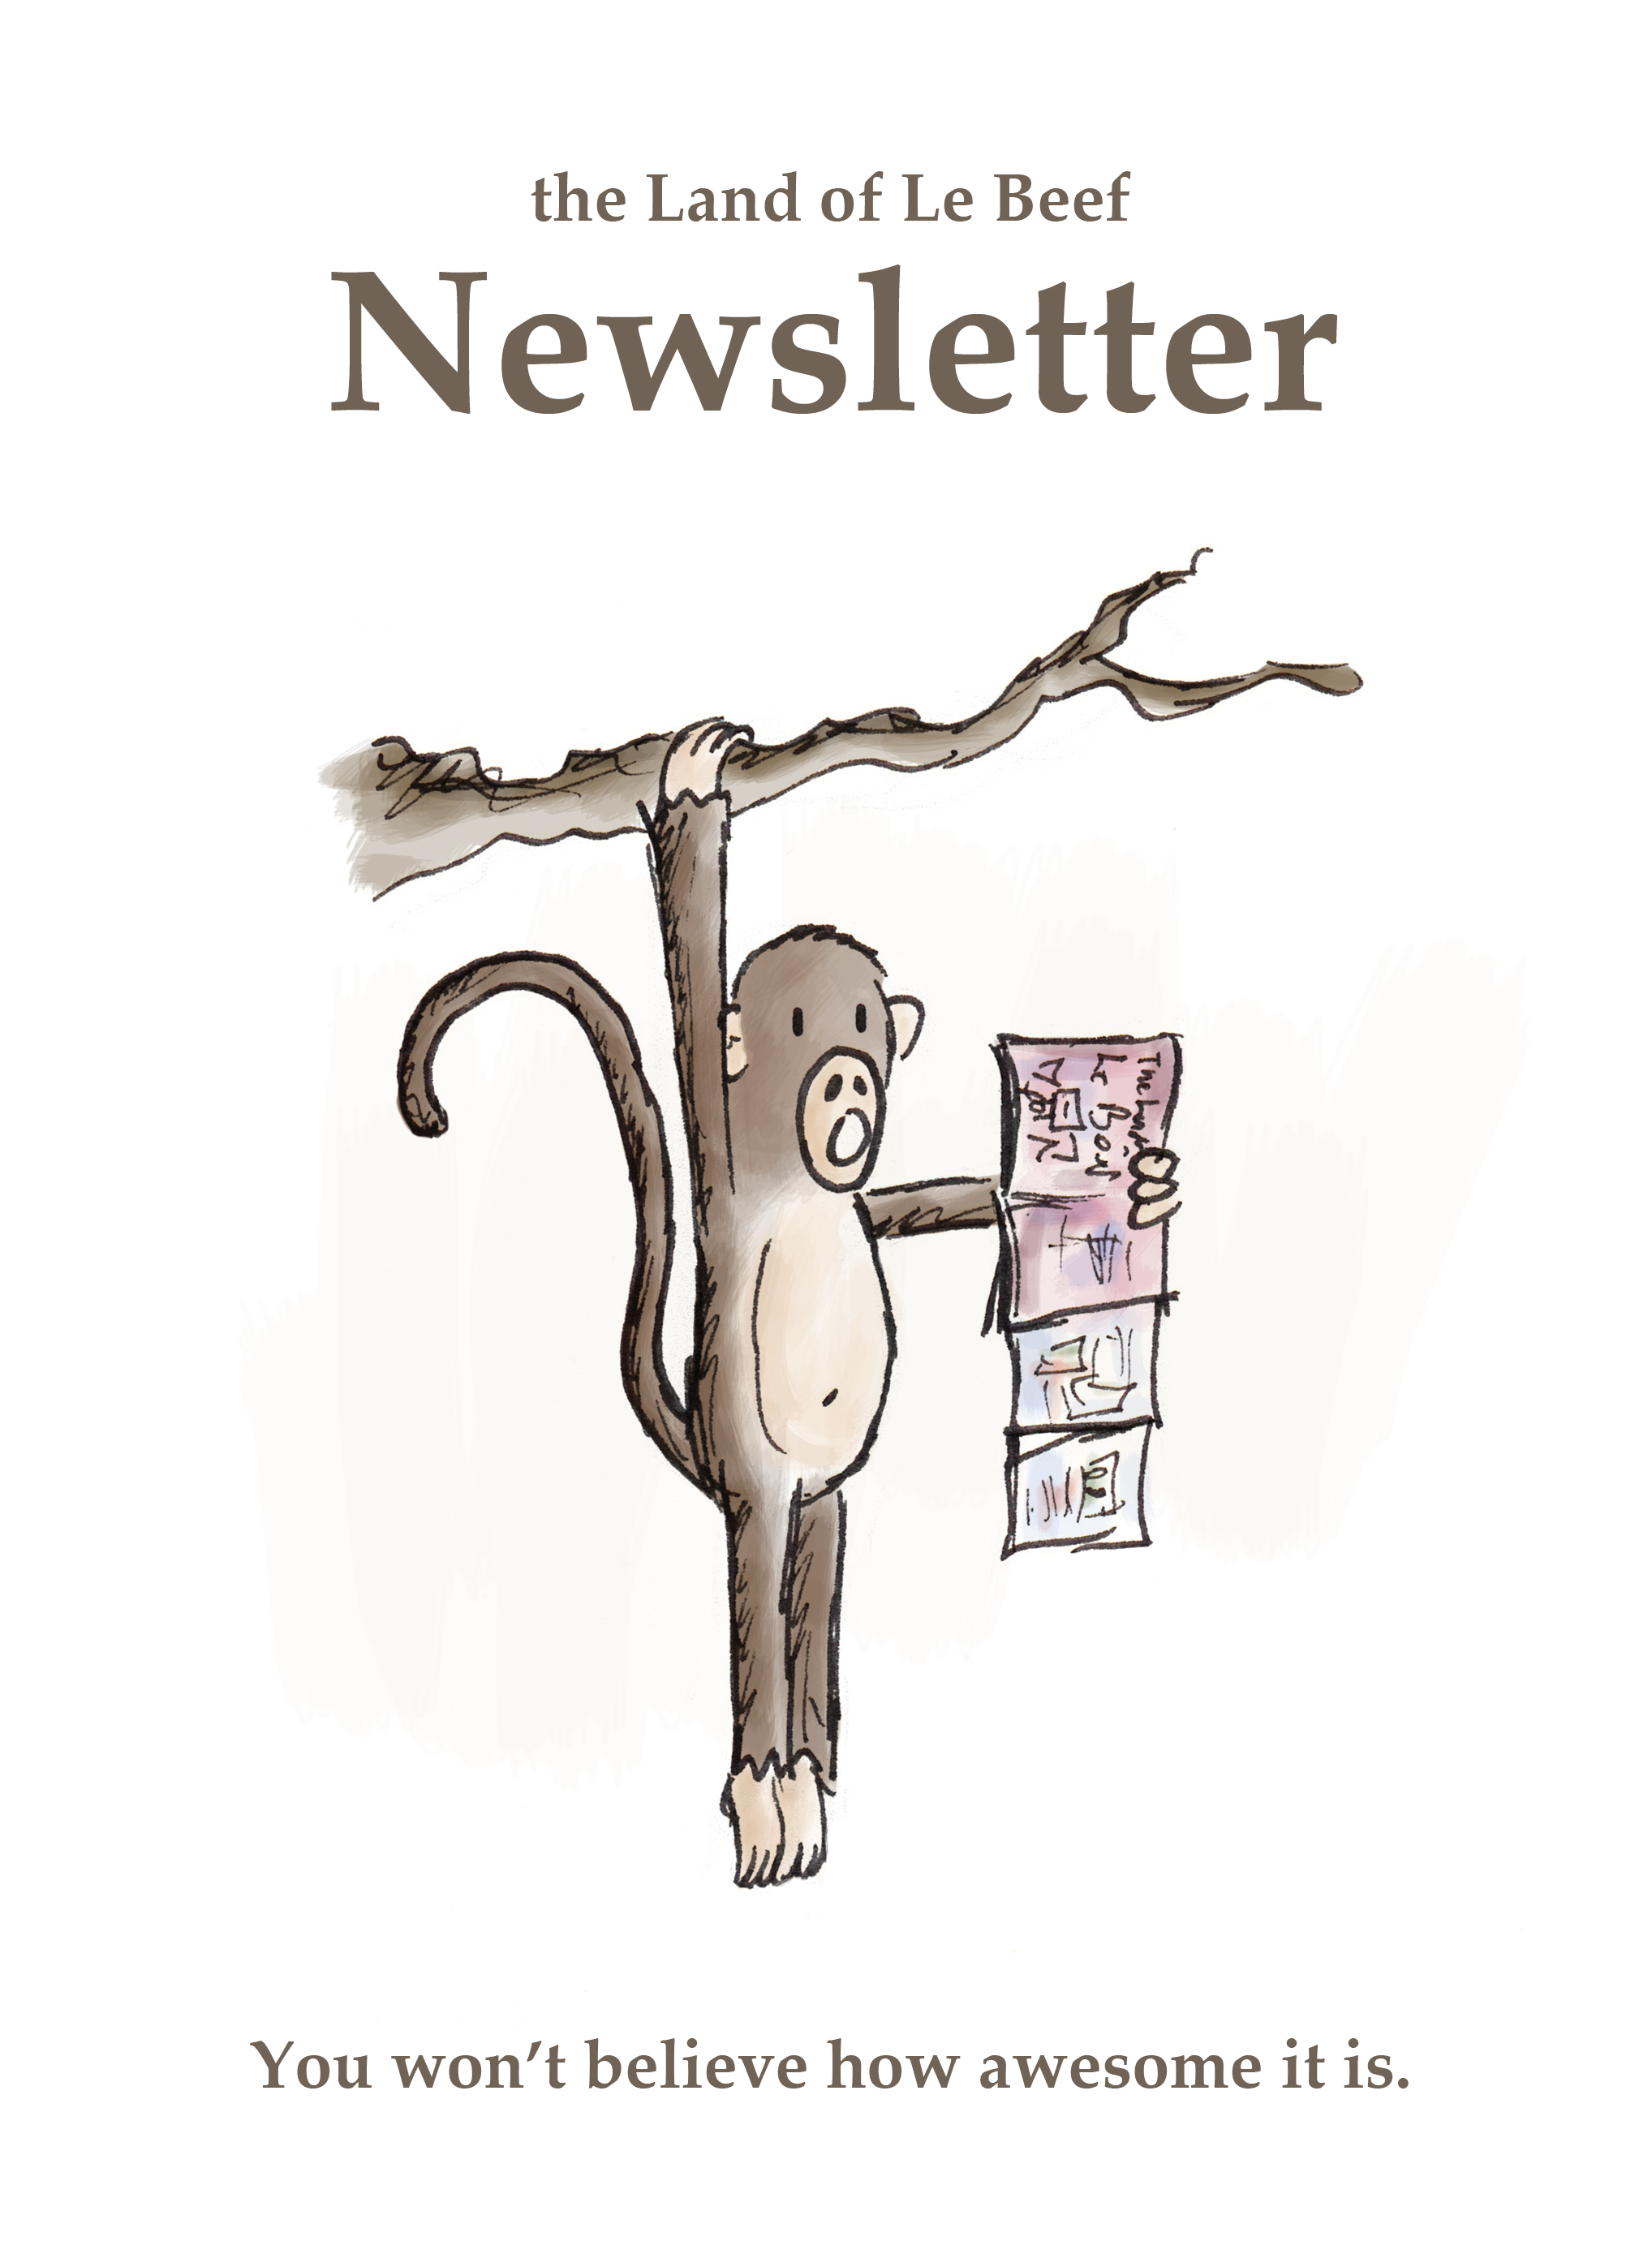 Beef_Newsletter_02.jpg